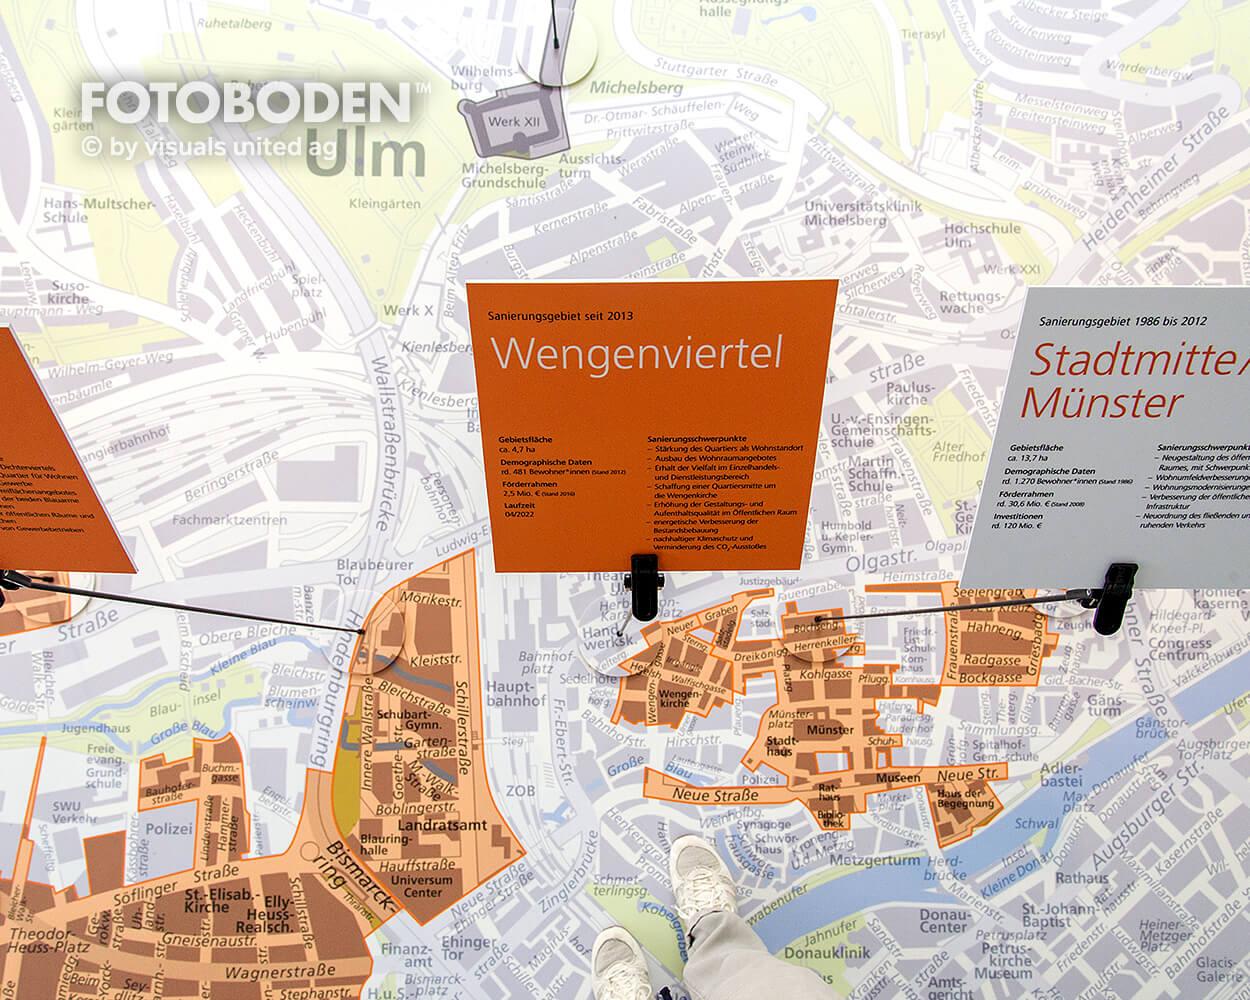 Sparkasse Ulm Ausstellung Museum  Raumkonzept Stimmung Museumsboden Ausstellungsboden Fotoboden Vinylboden Flooring Individuell Event3